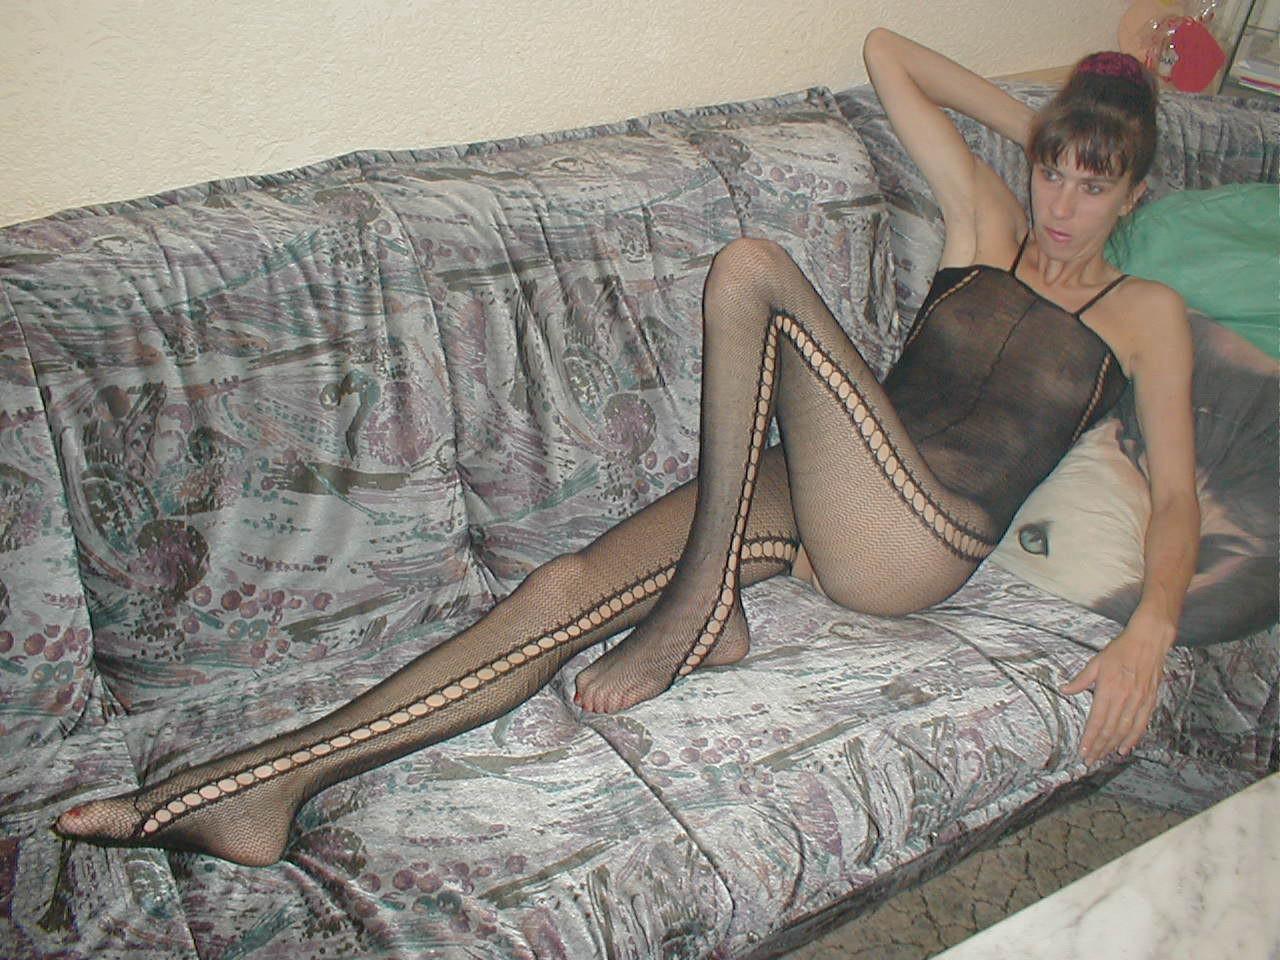 http://pbs-2.adult-empire.com/85/8570/021/pic/7.jpg